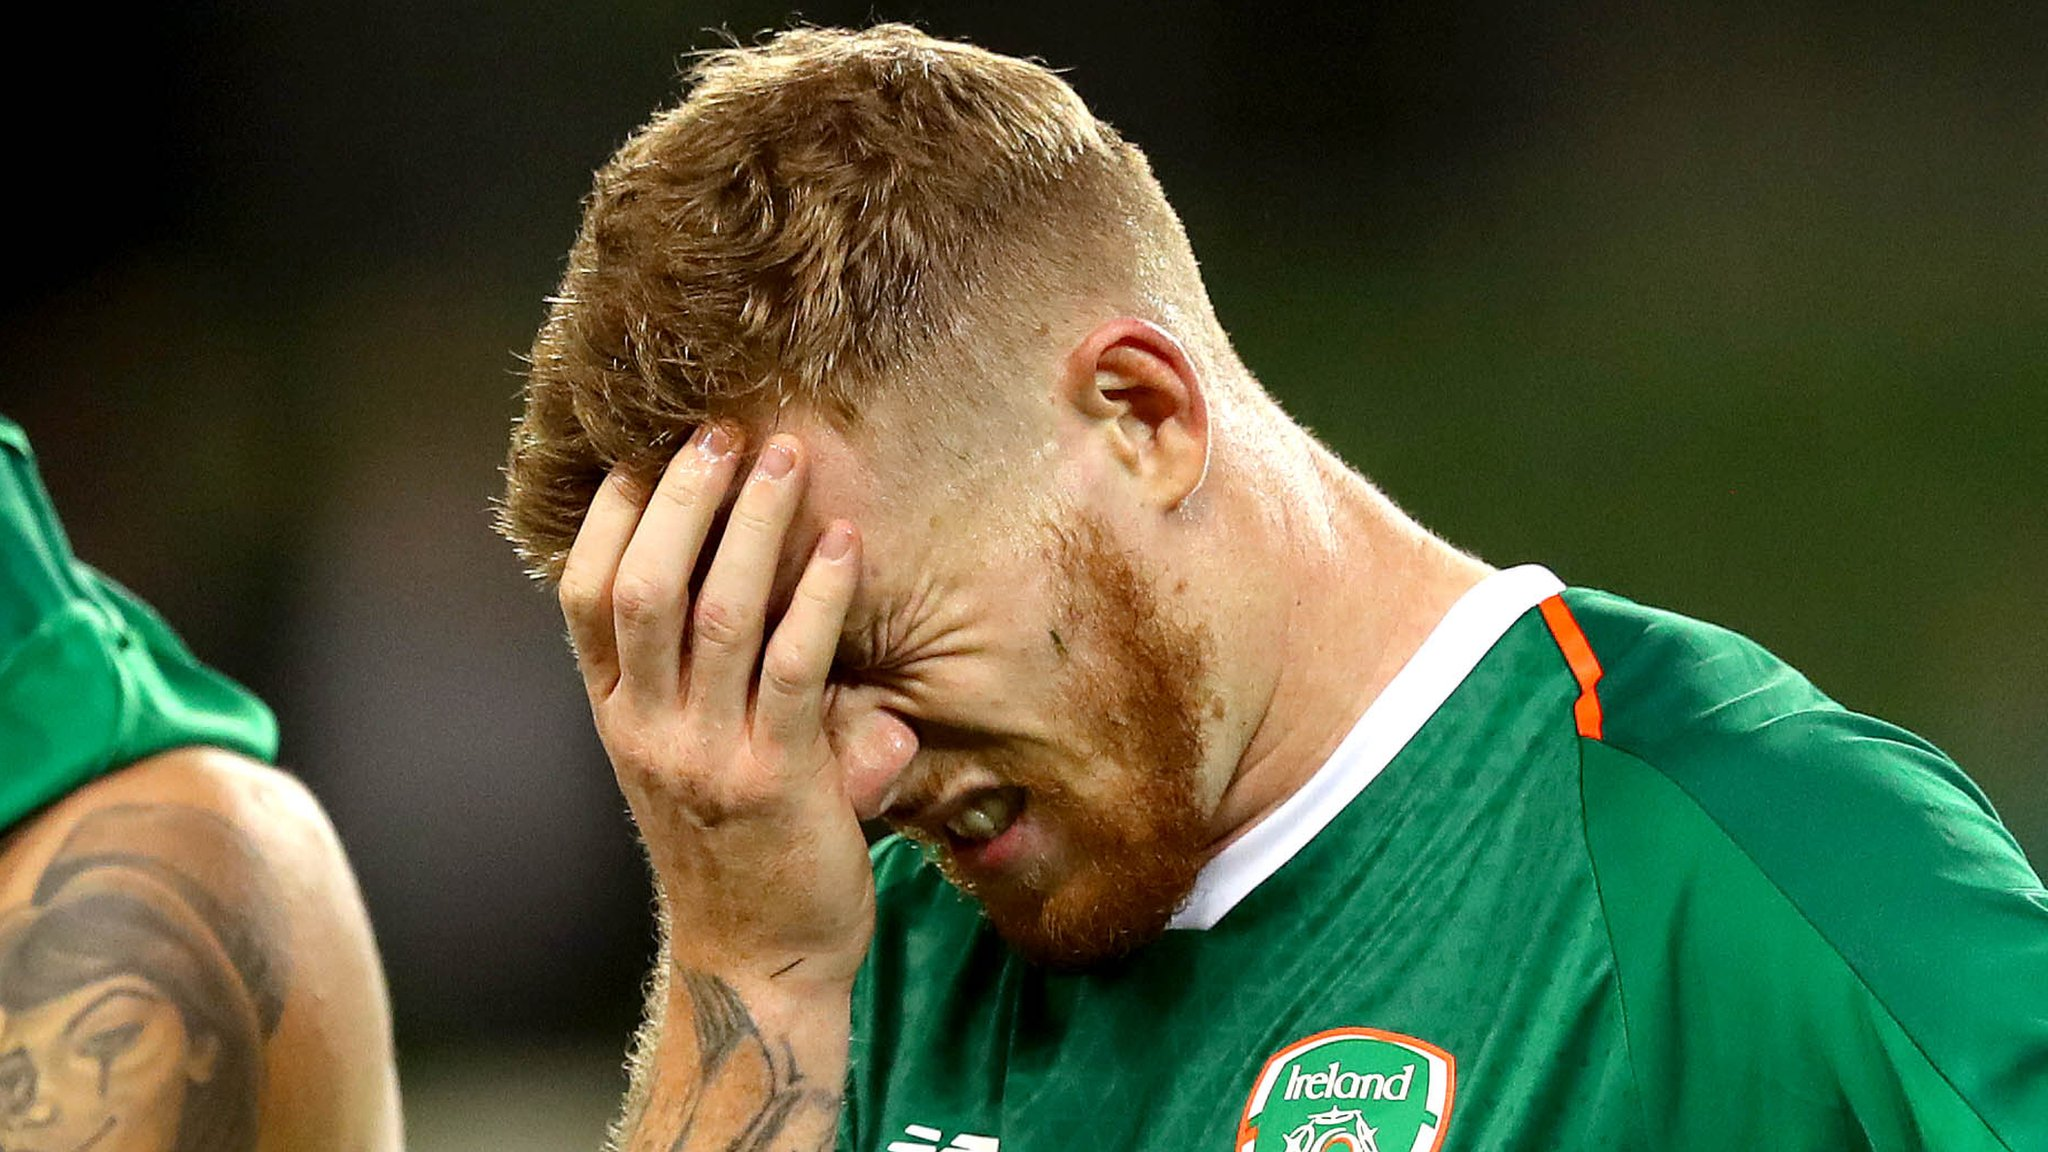 Republic of Ireland boss O'Neill sees 'positives' despite defeat